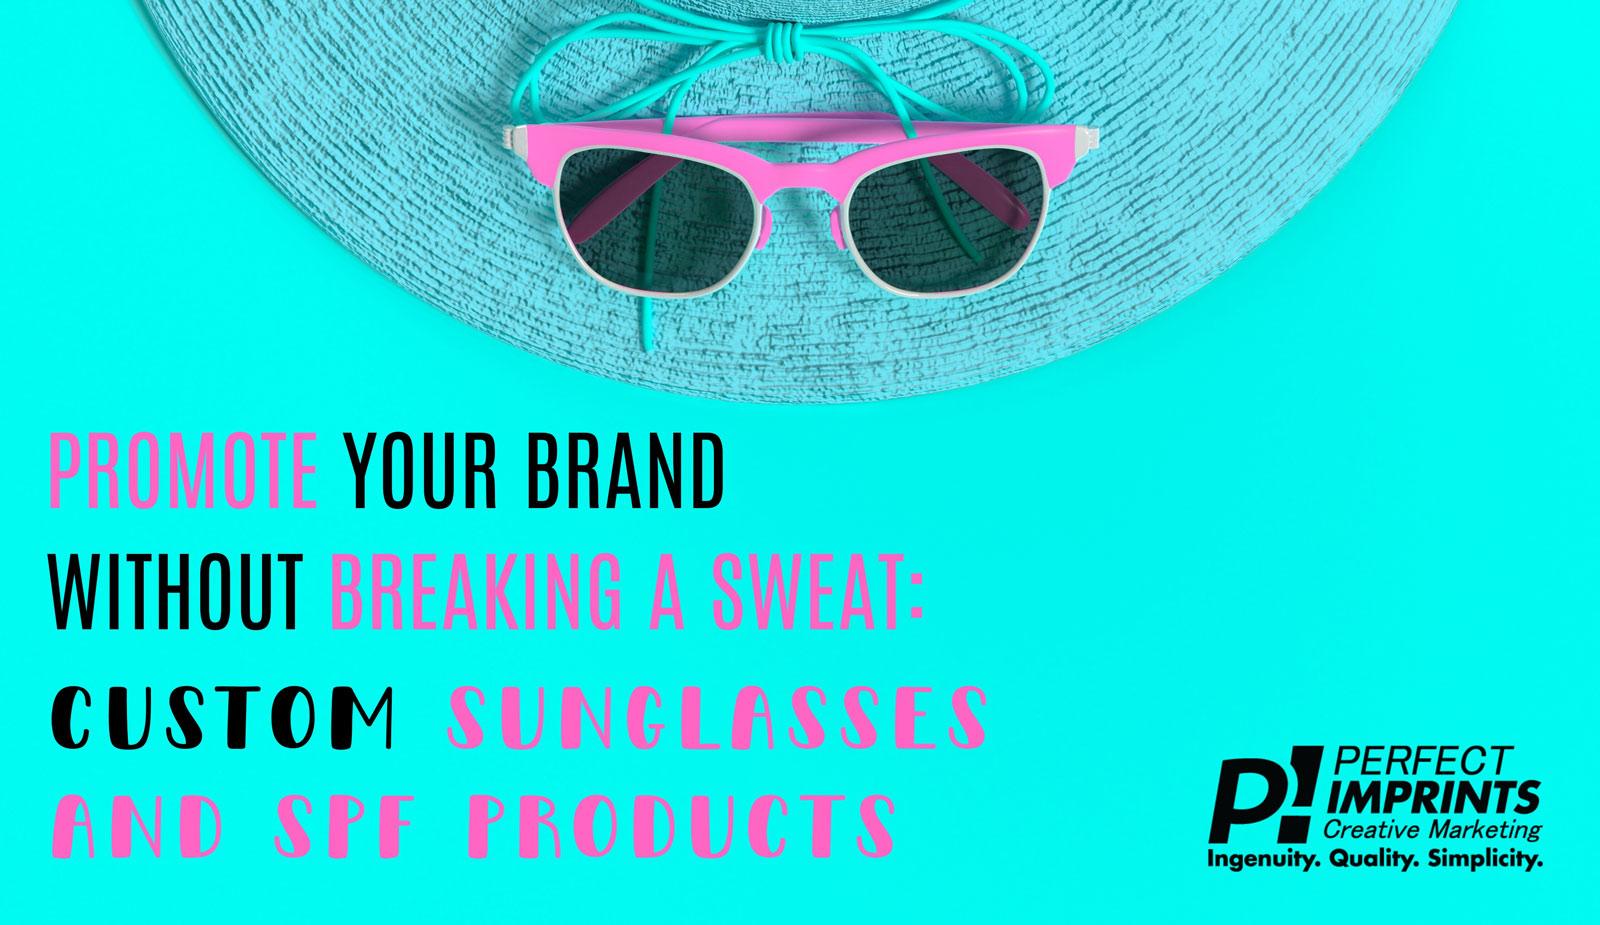 Custom Sunglasses and Promotional Sunscreen